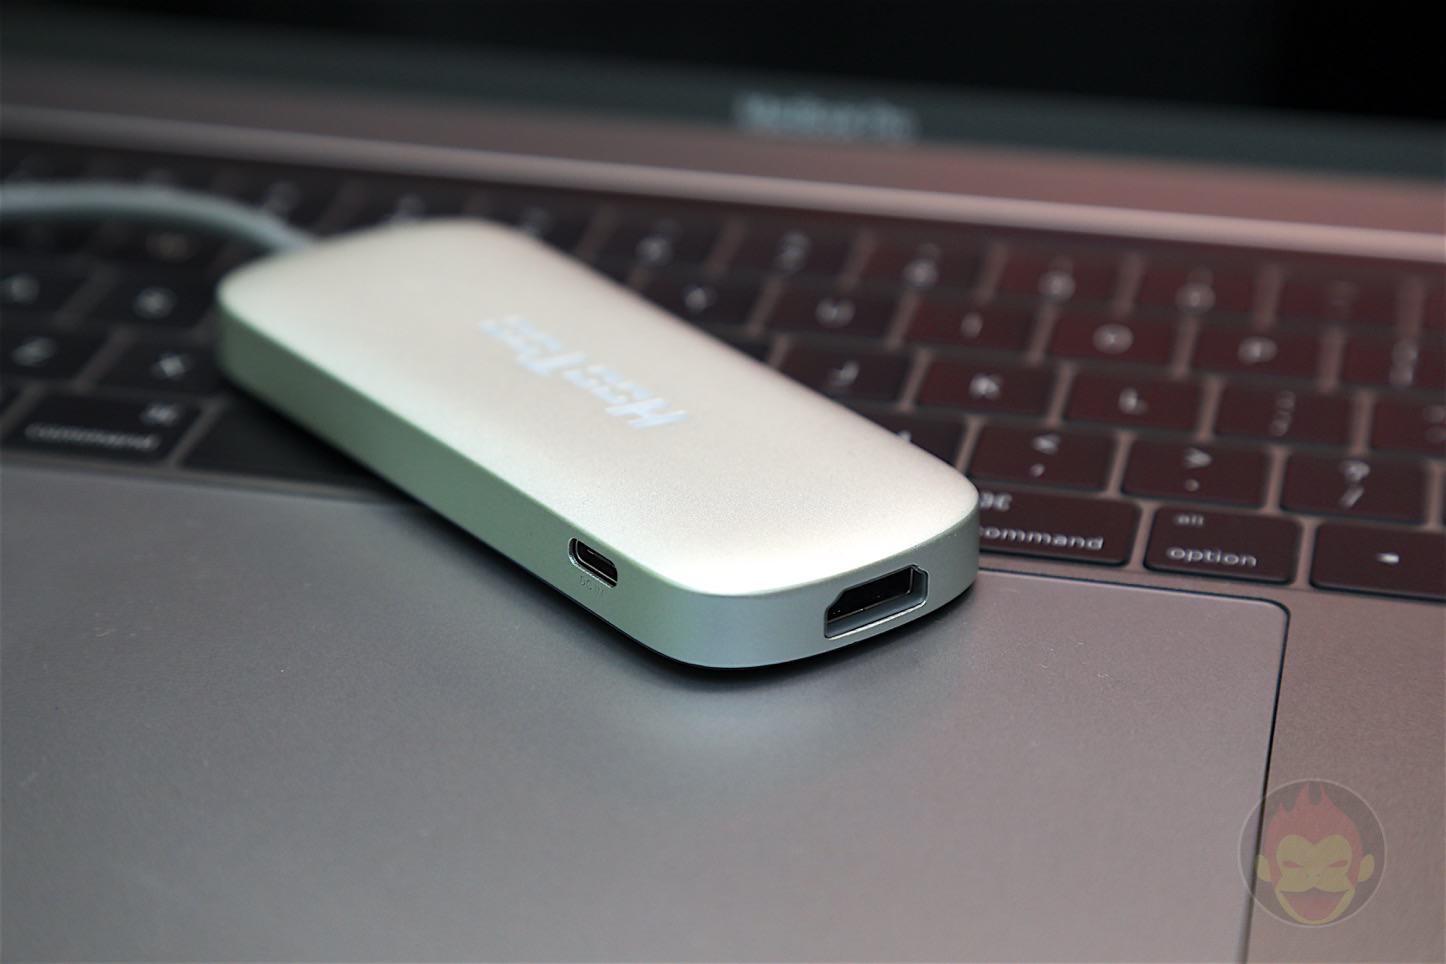 HooToo-Shuttle-USB-C-Hub-03.jpg